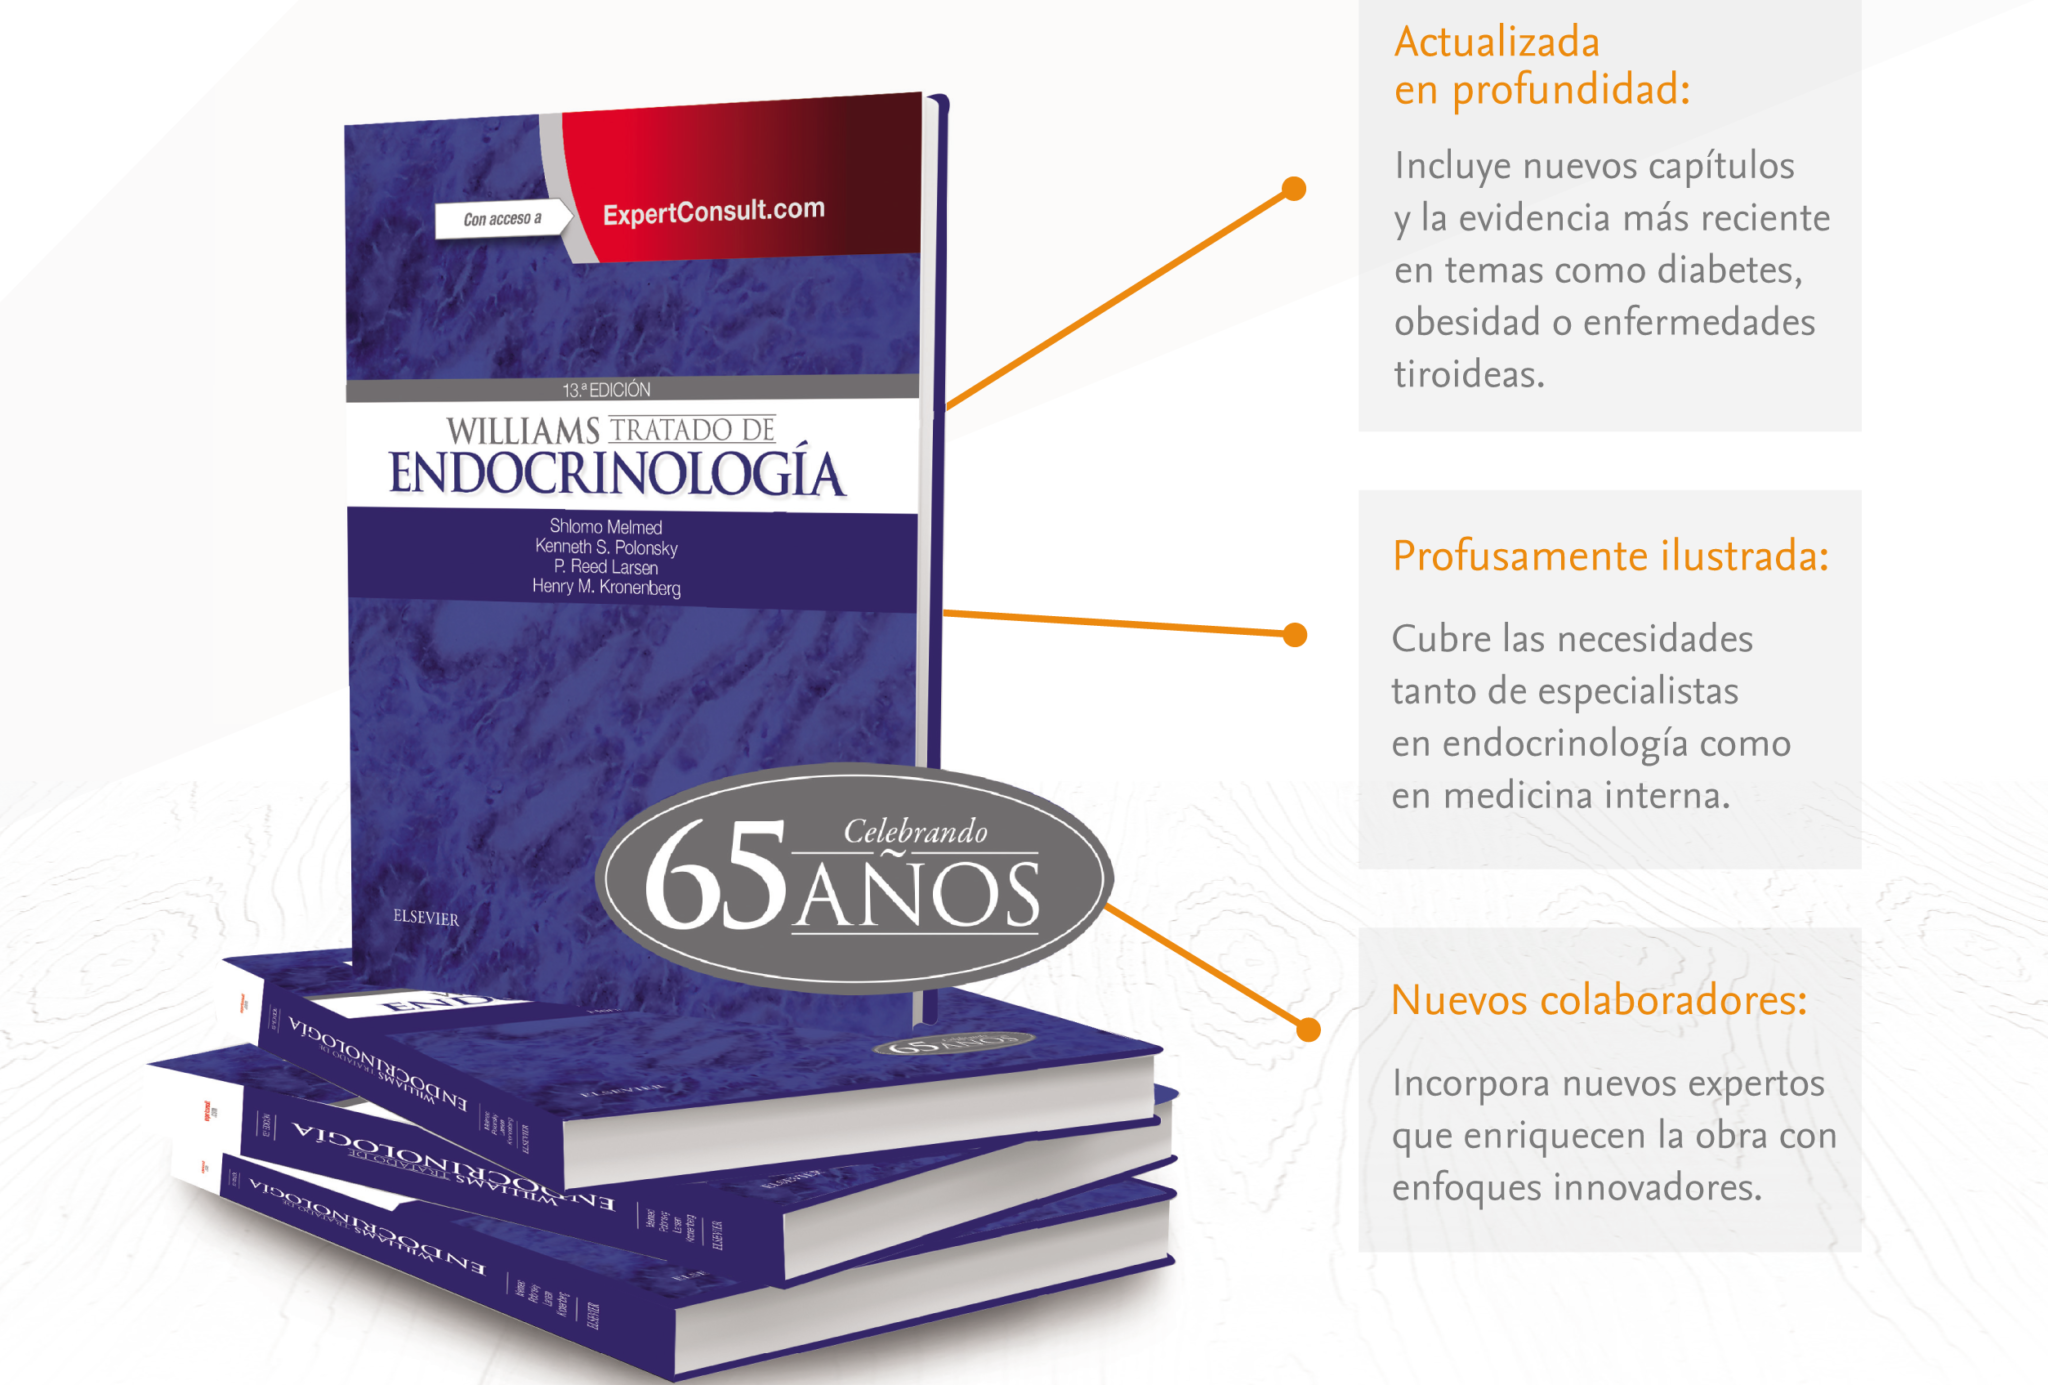 Anuncio-revista1.png